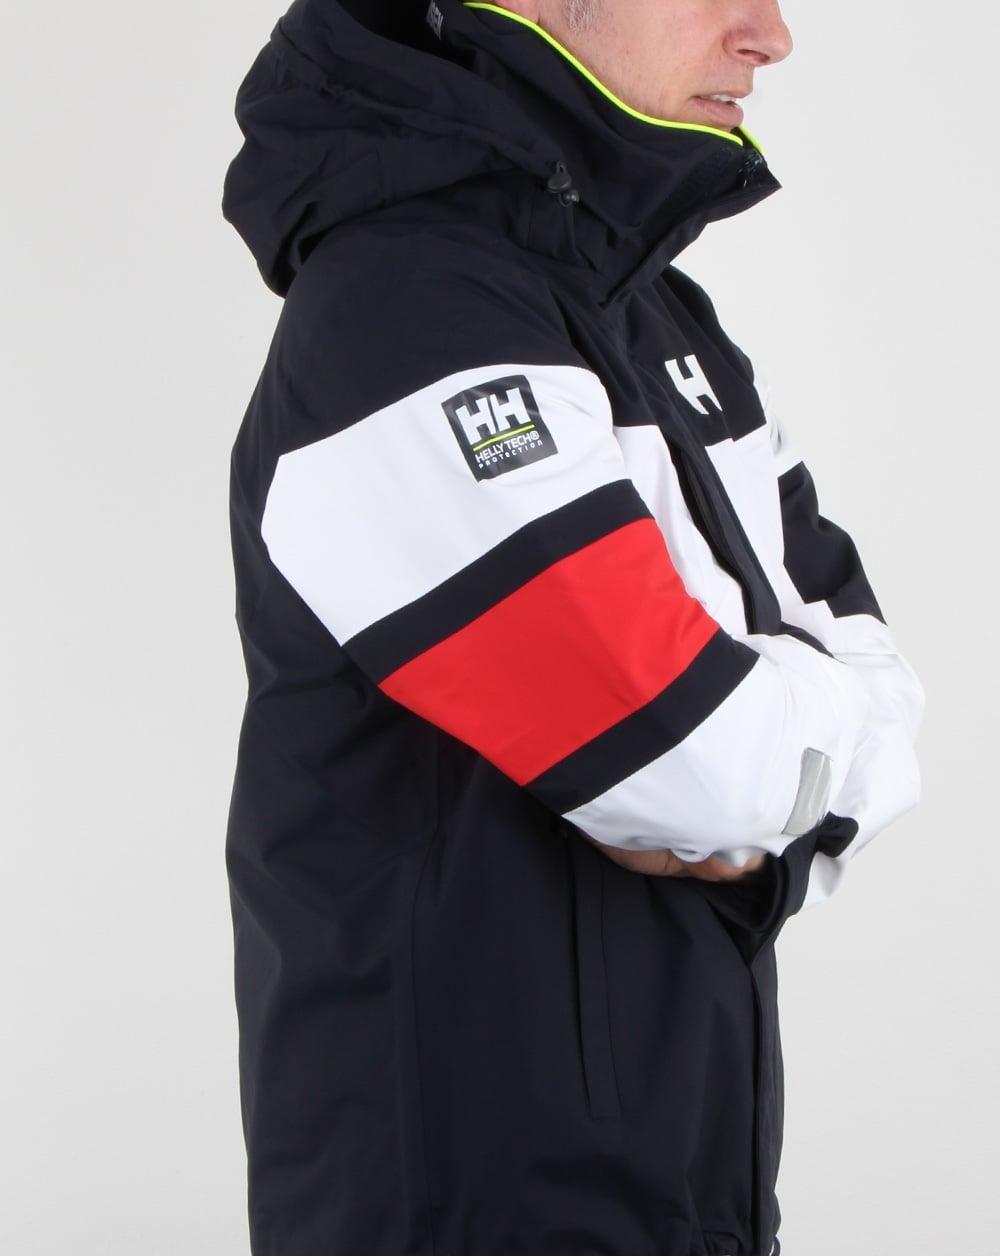 Jacket Waterproof Helly Navy Jacket Tech Mens Helly Salt Light Hansen 0FqPY1Tf